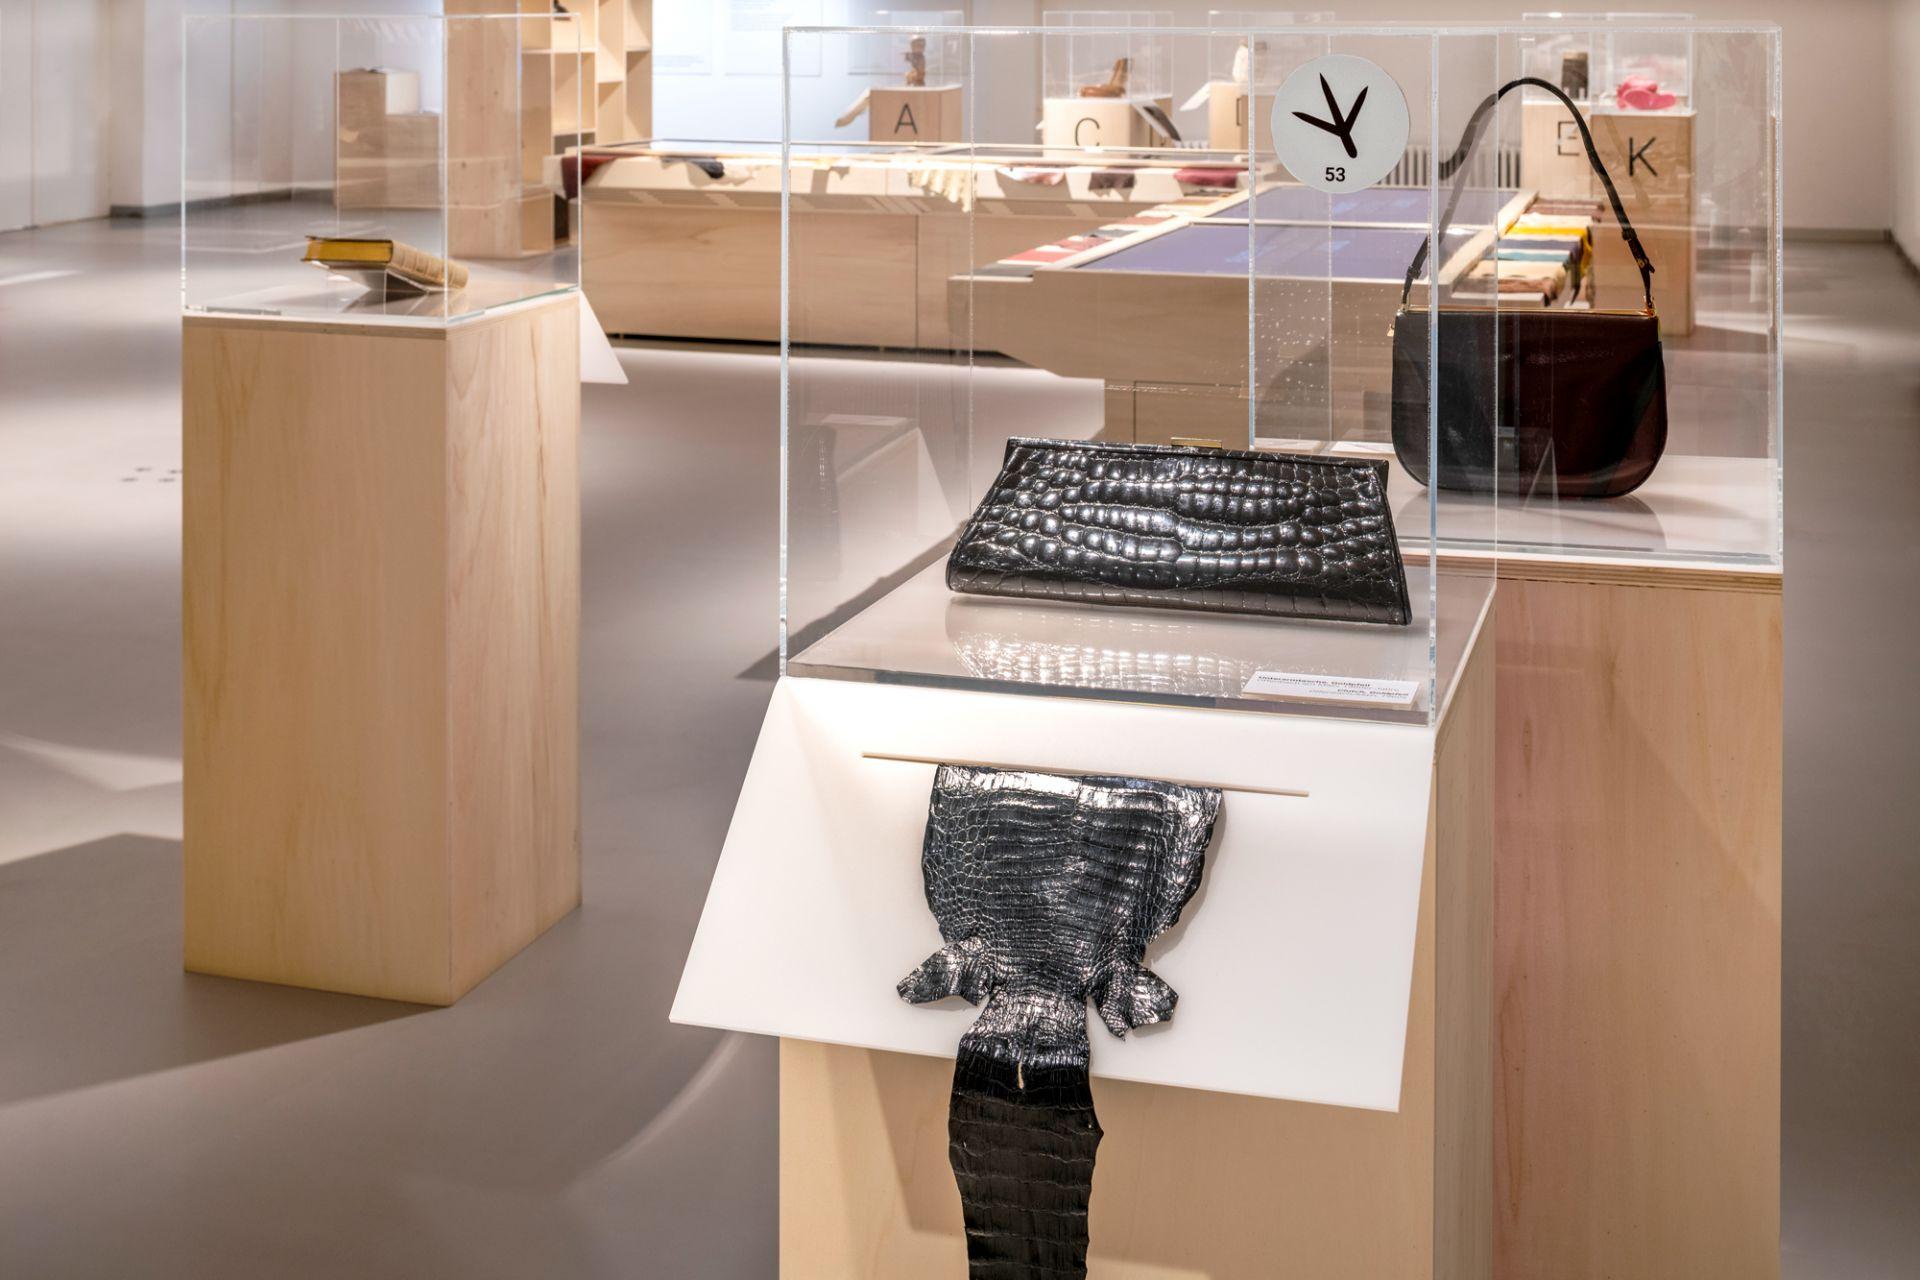 Hands-on station crocodile leather, Clutch bag, Goldpfeil, Offenbach/Main, 1960s